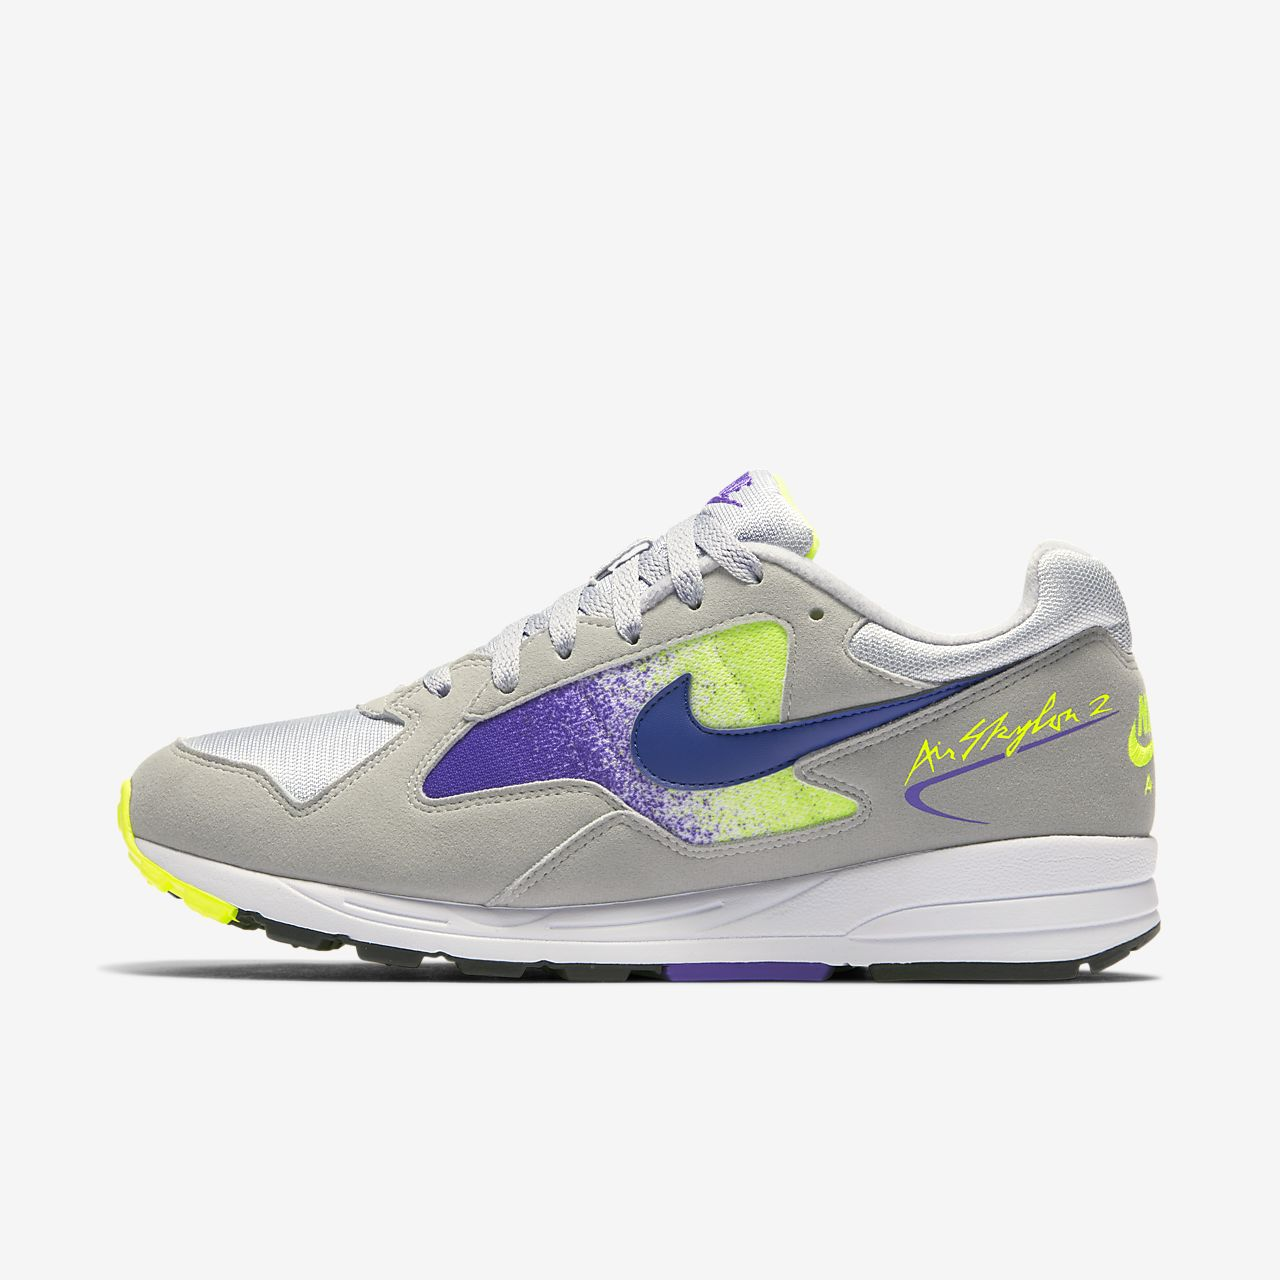 meet ee7d8 4dc93 ... Scarpa Nike Air Skylon II - Uomo